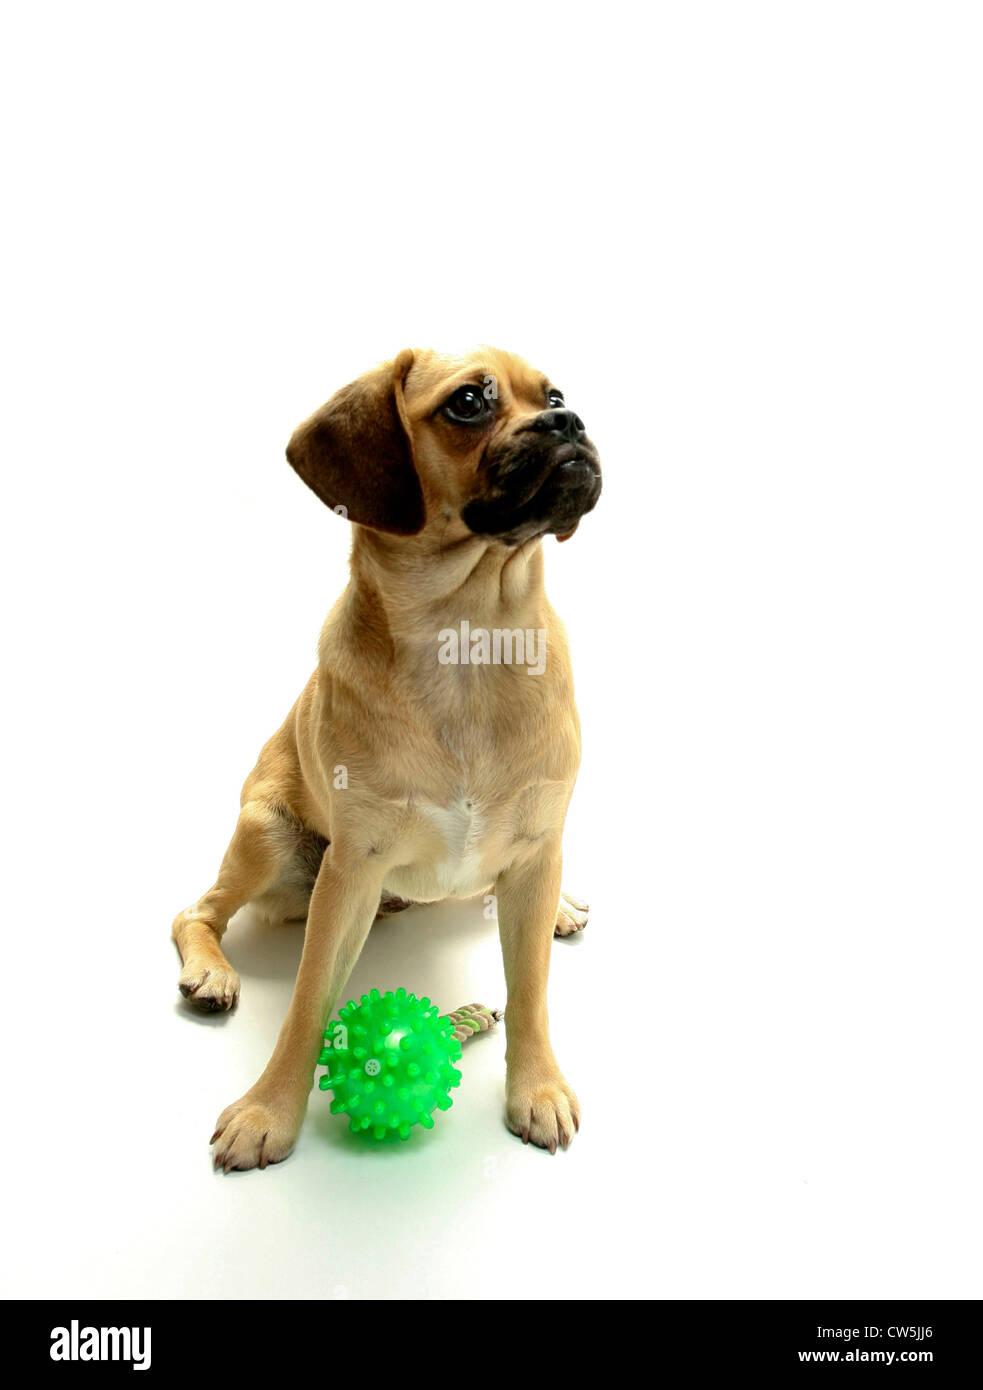 Puggle puppy with a dog training dummy - Stock Image